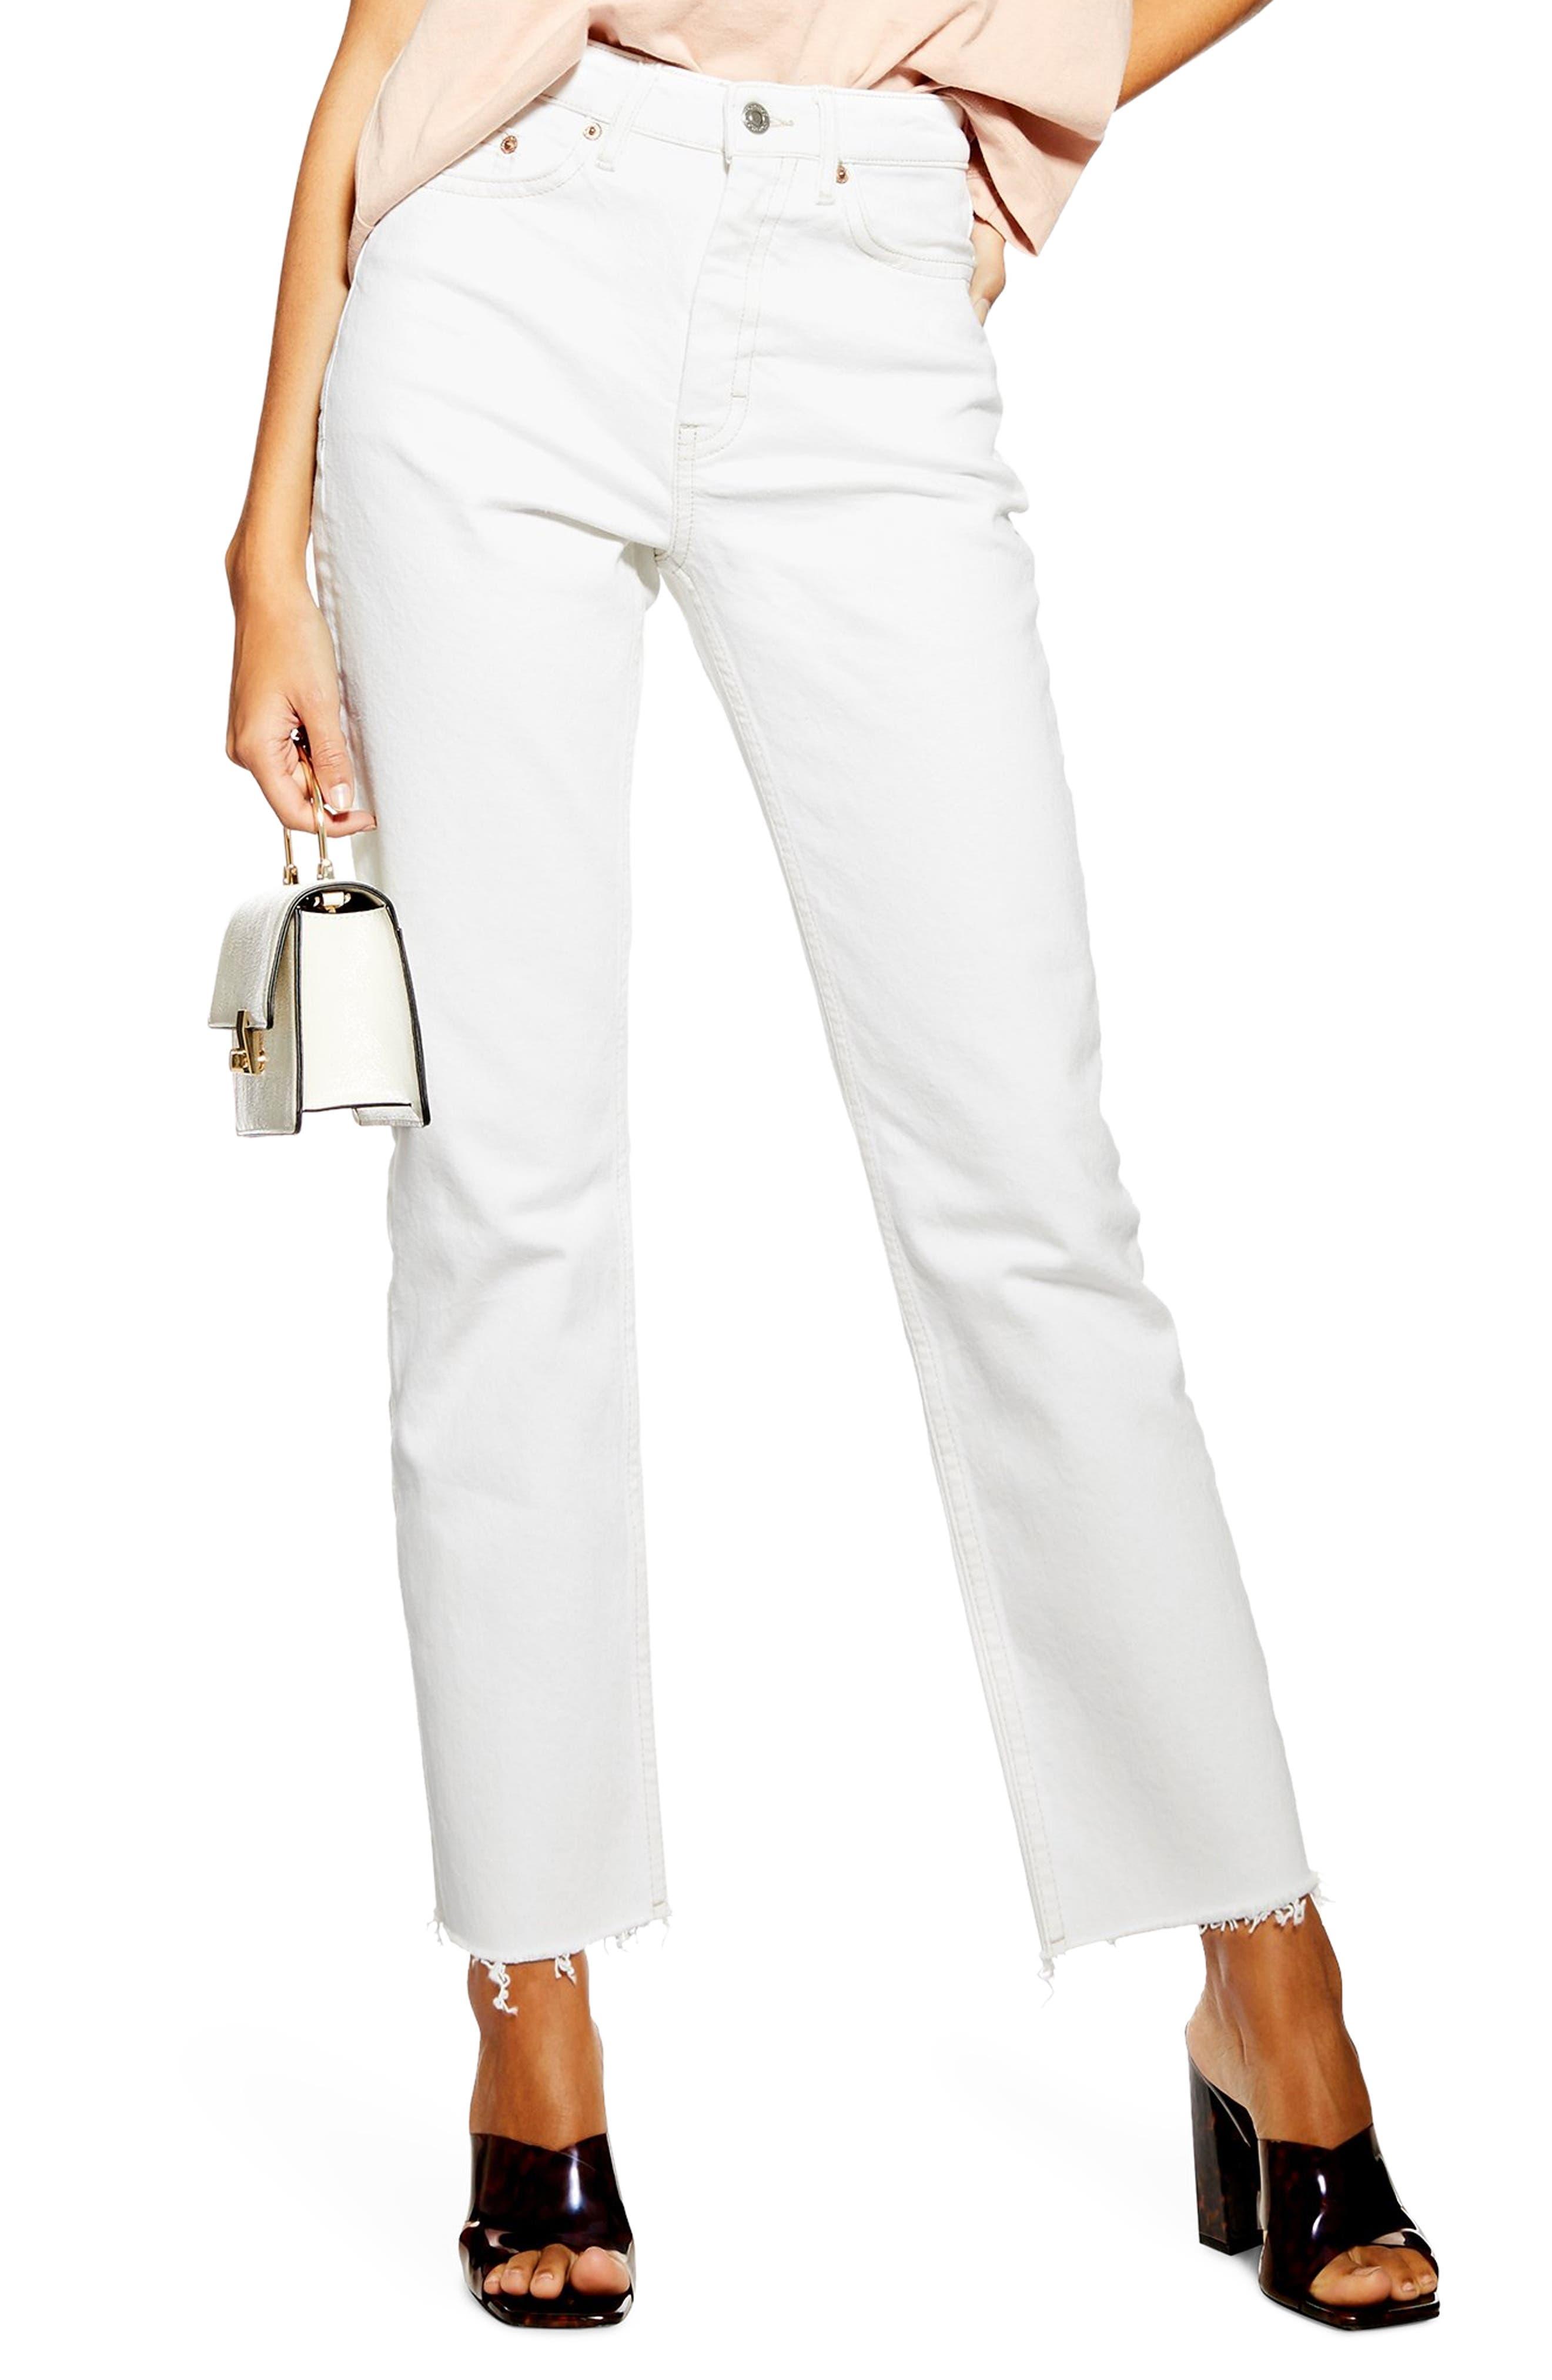 Topshop Straight Leg Jeans Coupon